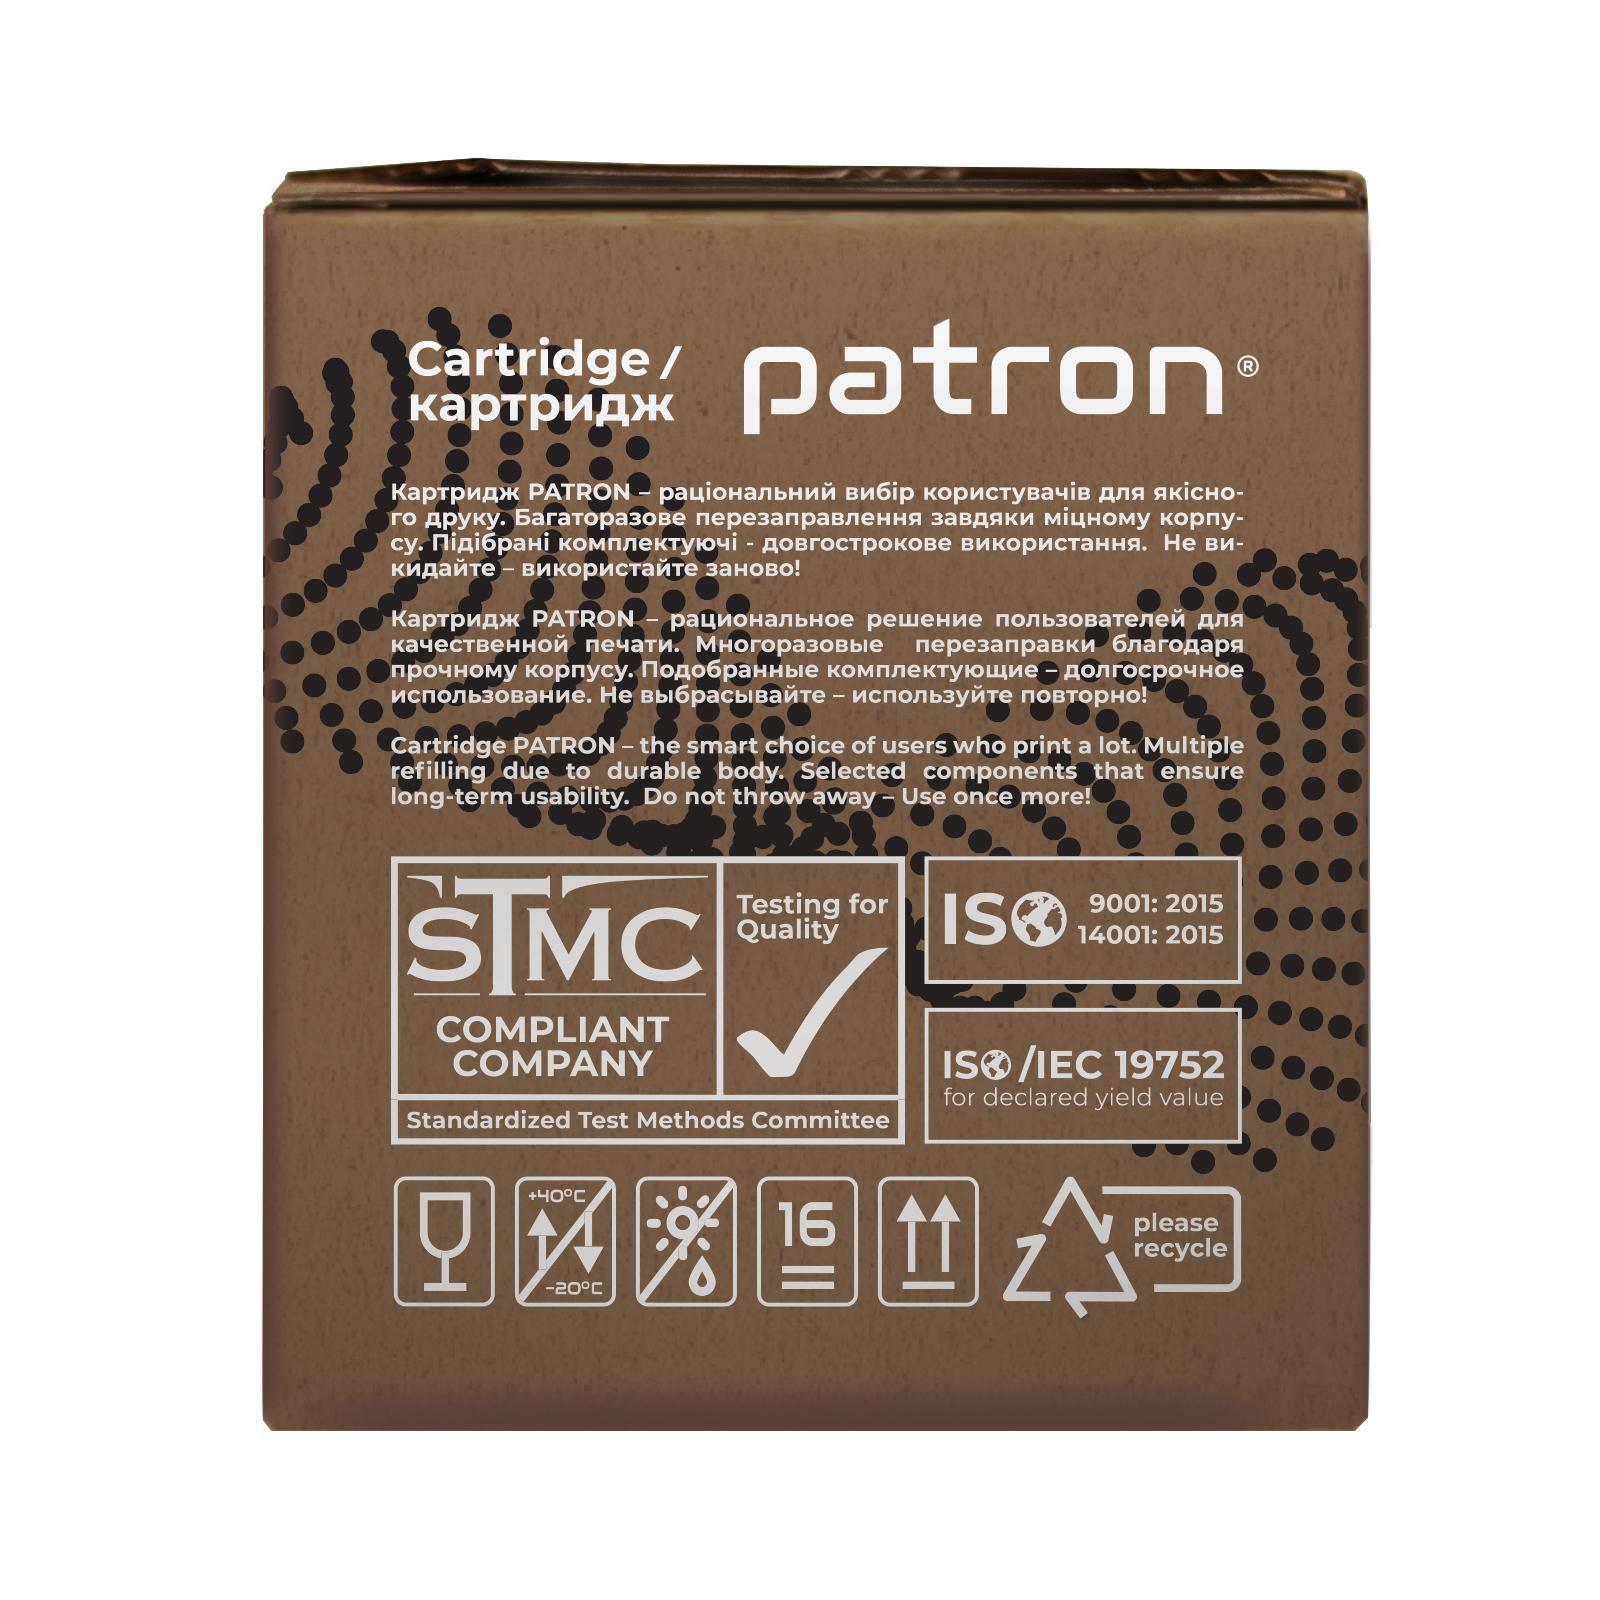 Картридж Patron CANON 726 GREEN Label (PN-726GL) изображение 4